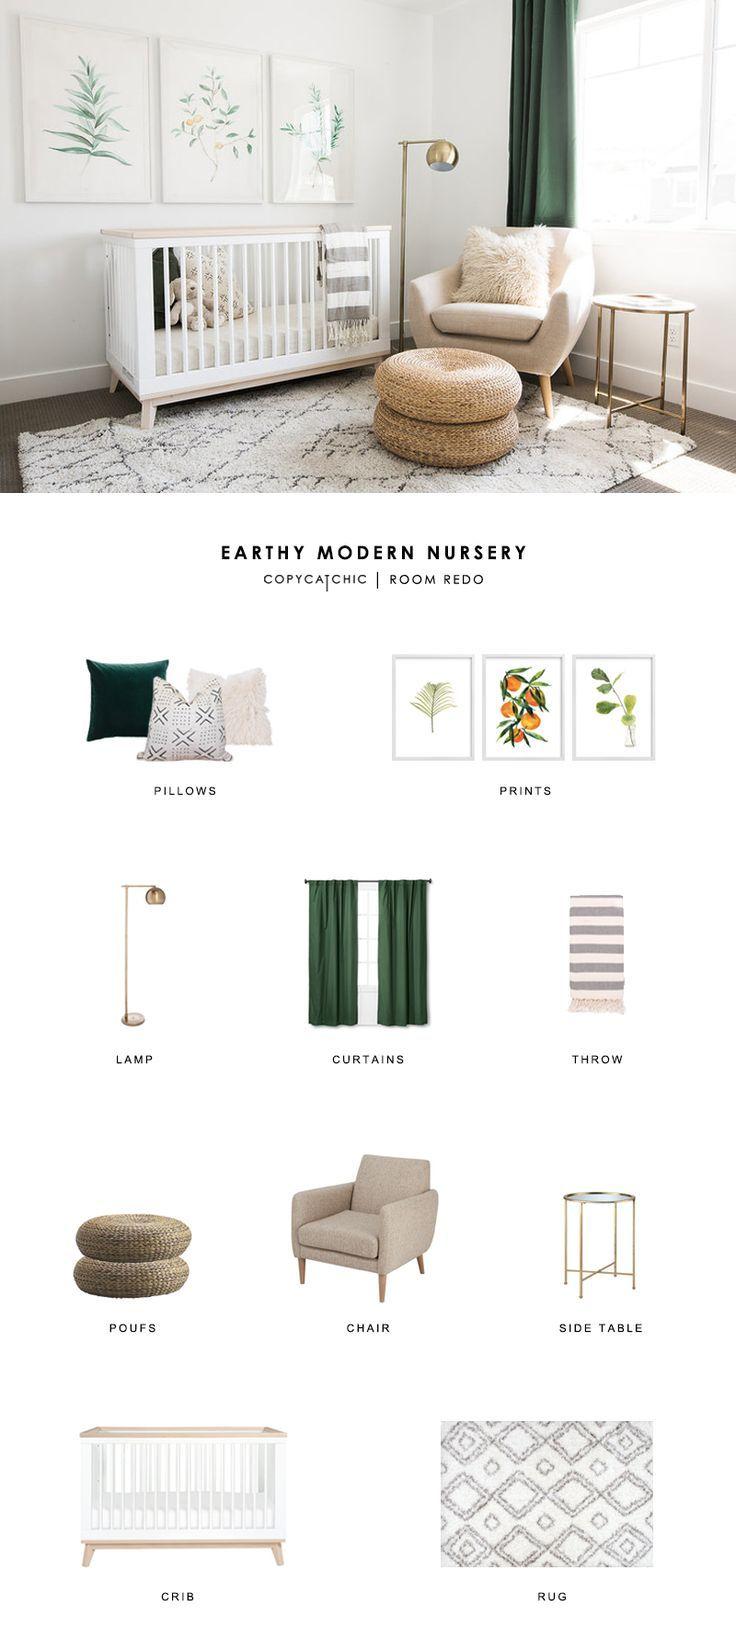 Room Redo   Earthy Modern Nursery – copycatchic